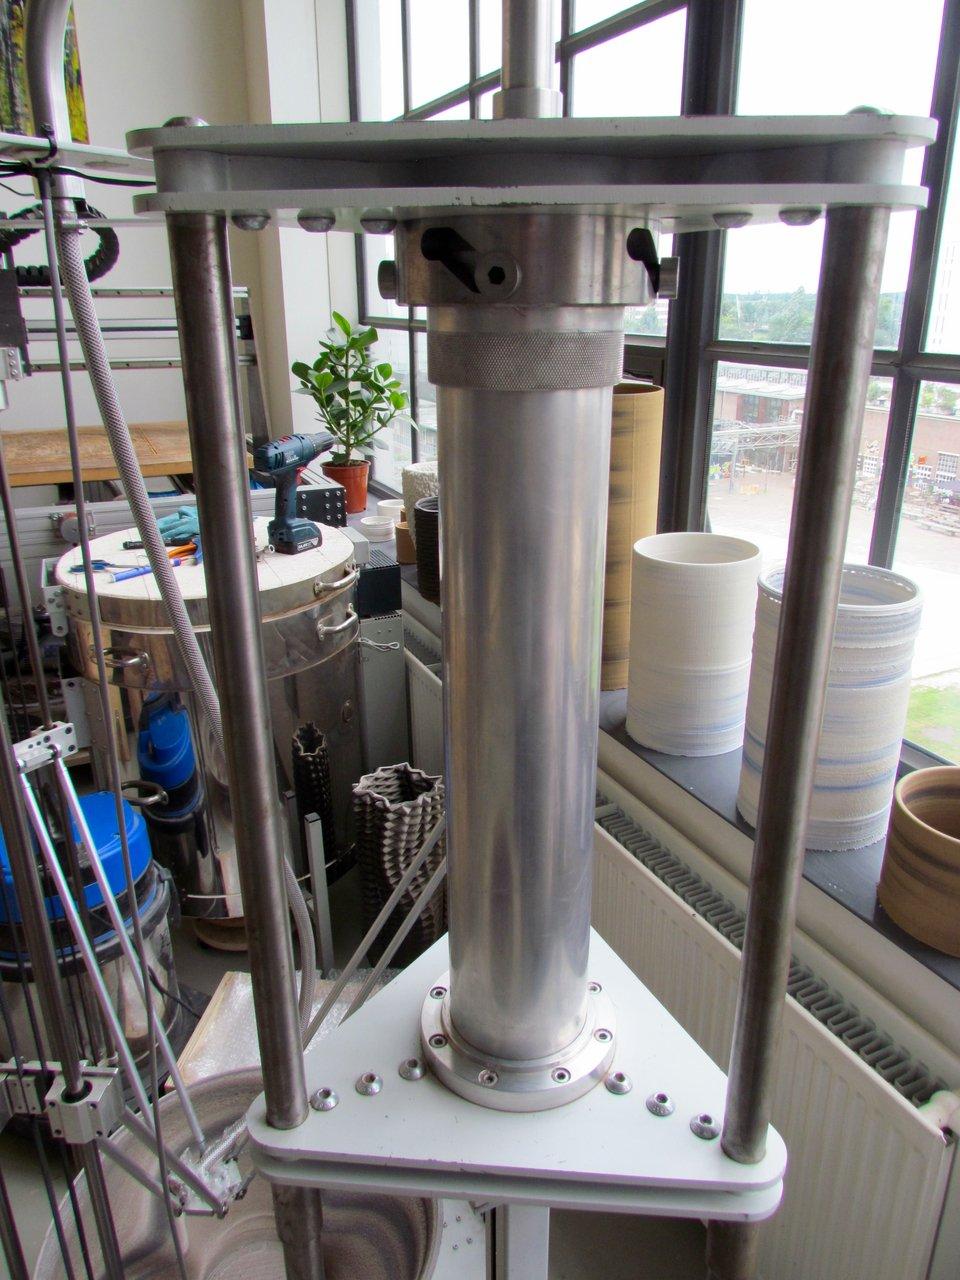 The powerful piston used to drive ceramics in Olivier van Herpt's ceramic 3D printer